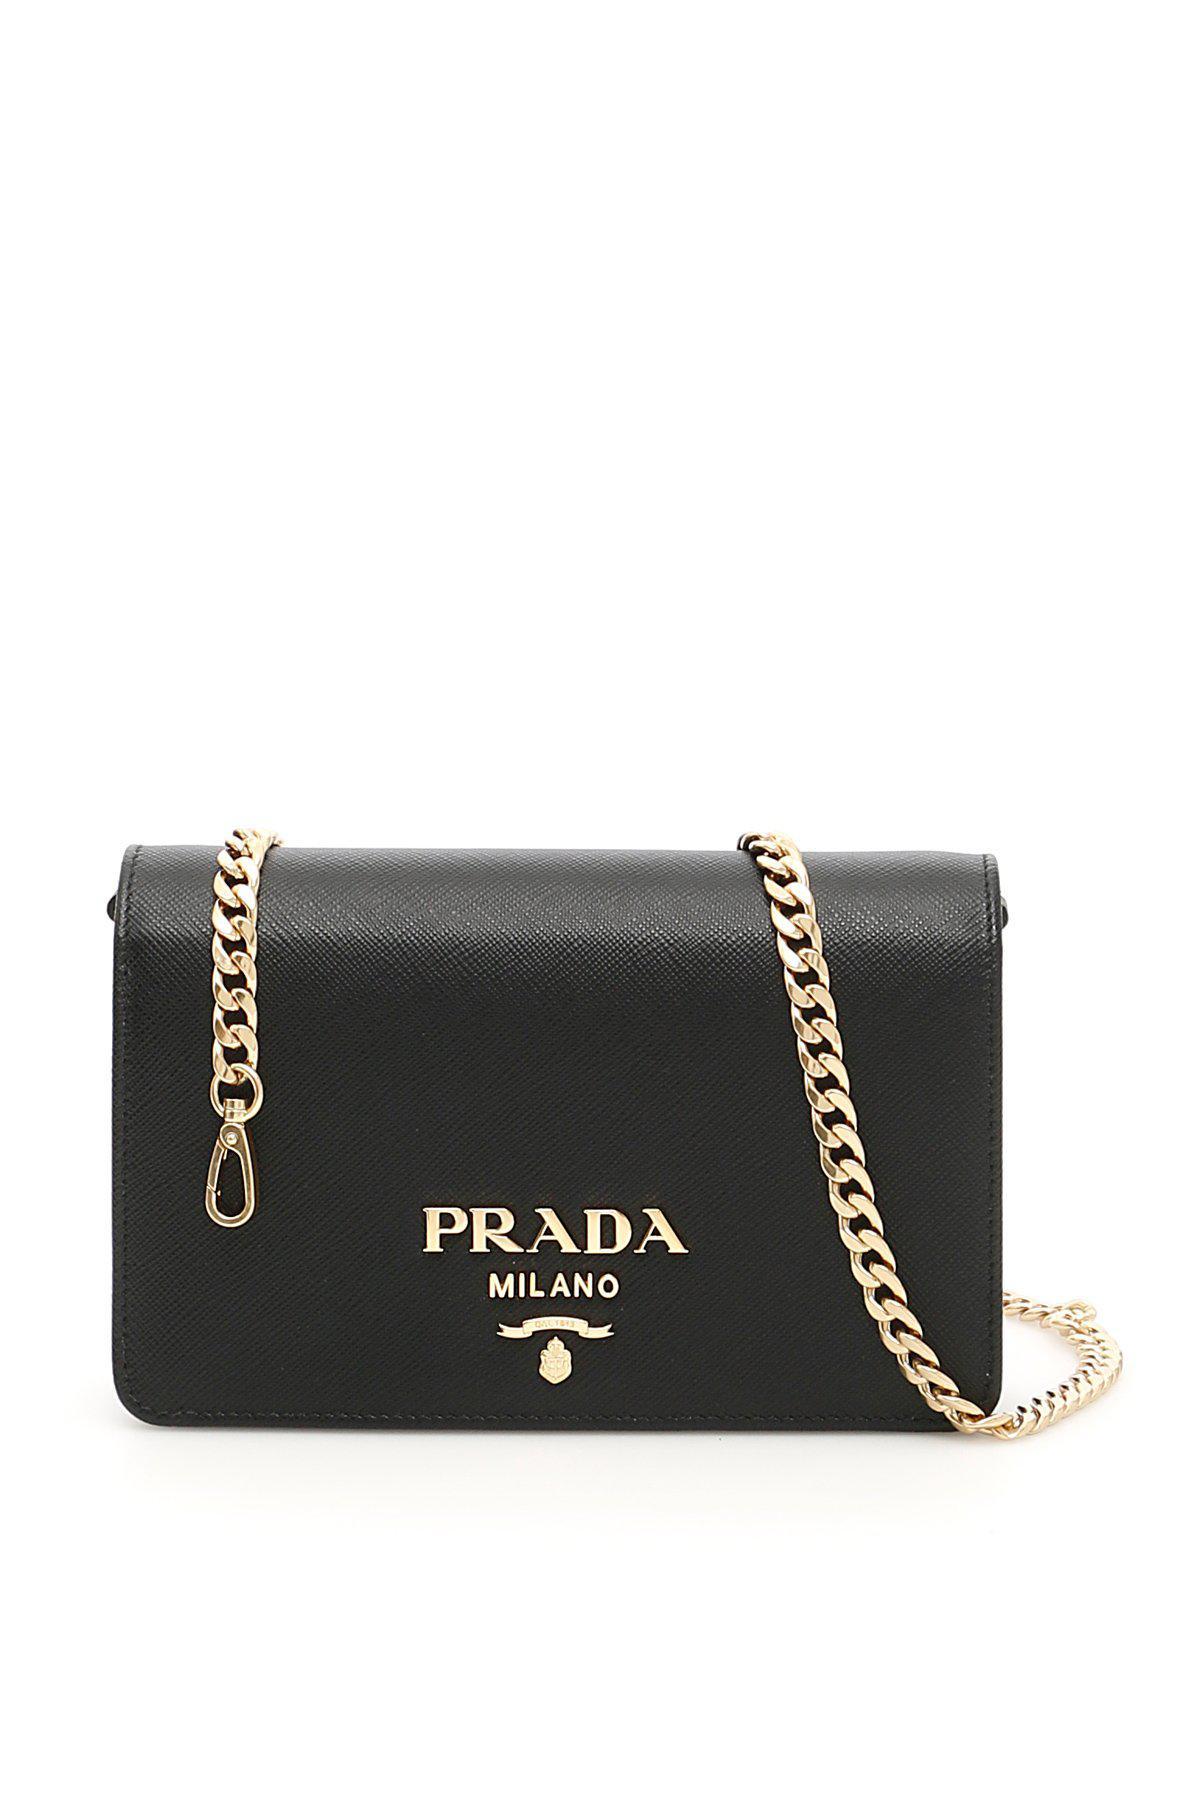 Lyst - Prada Logo Milano Saffiano Shoulder Bag in Black - Save ... 735485abc2f43